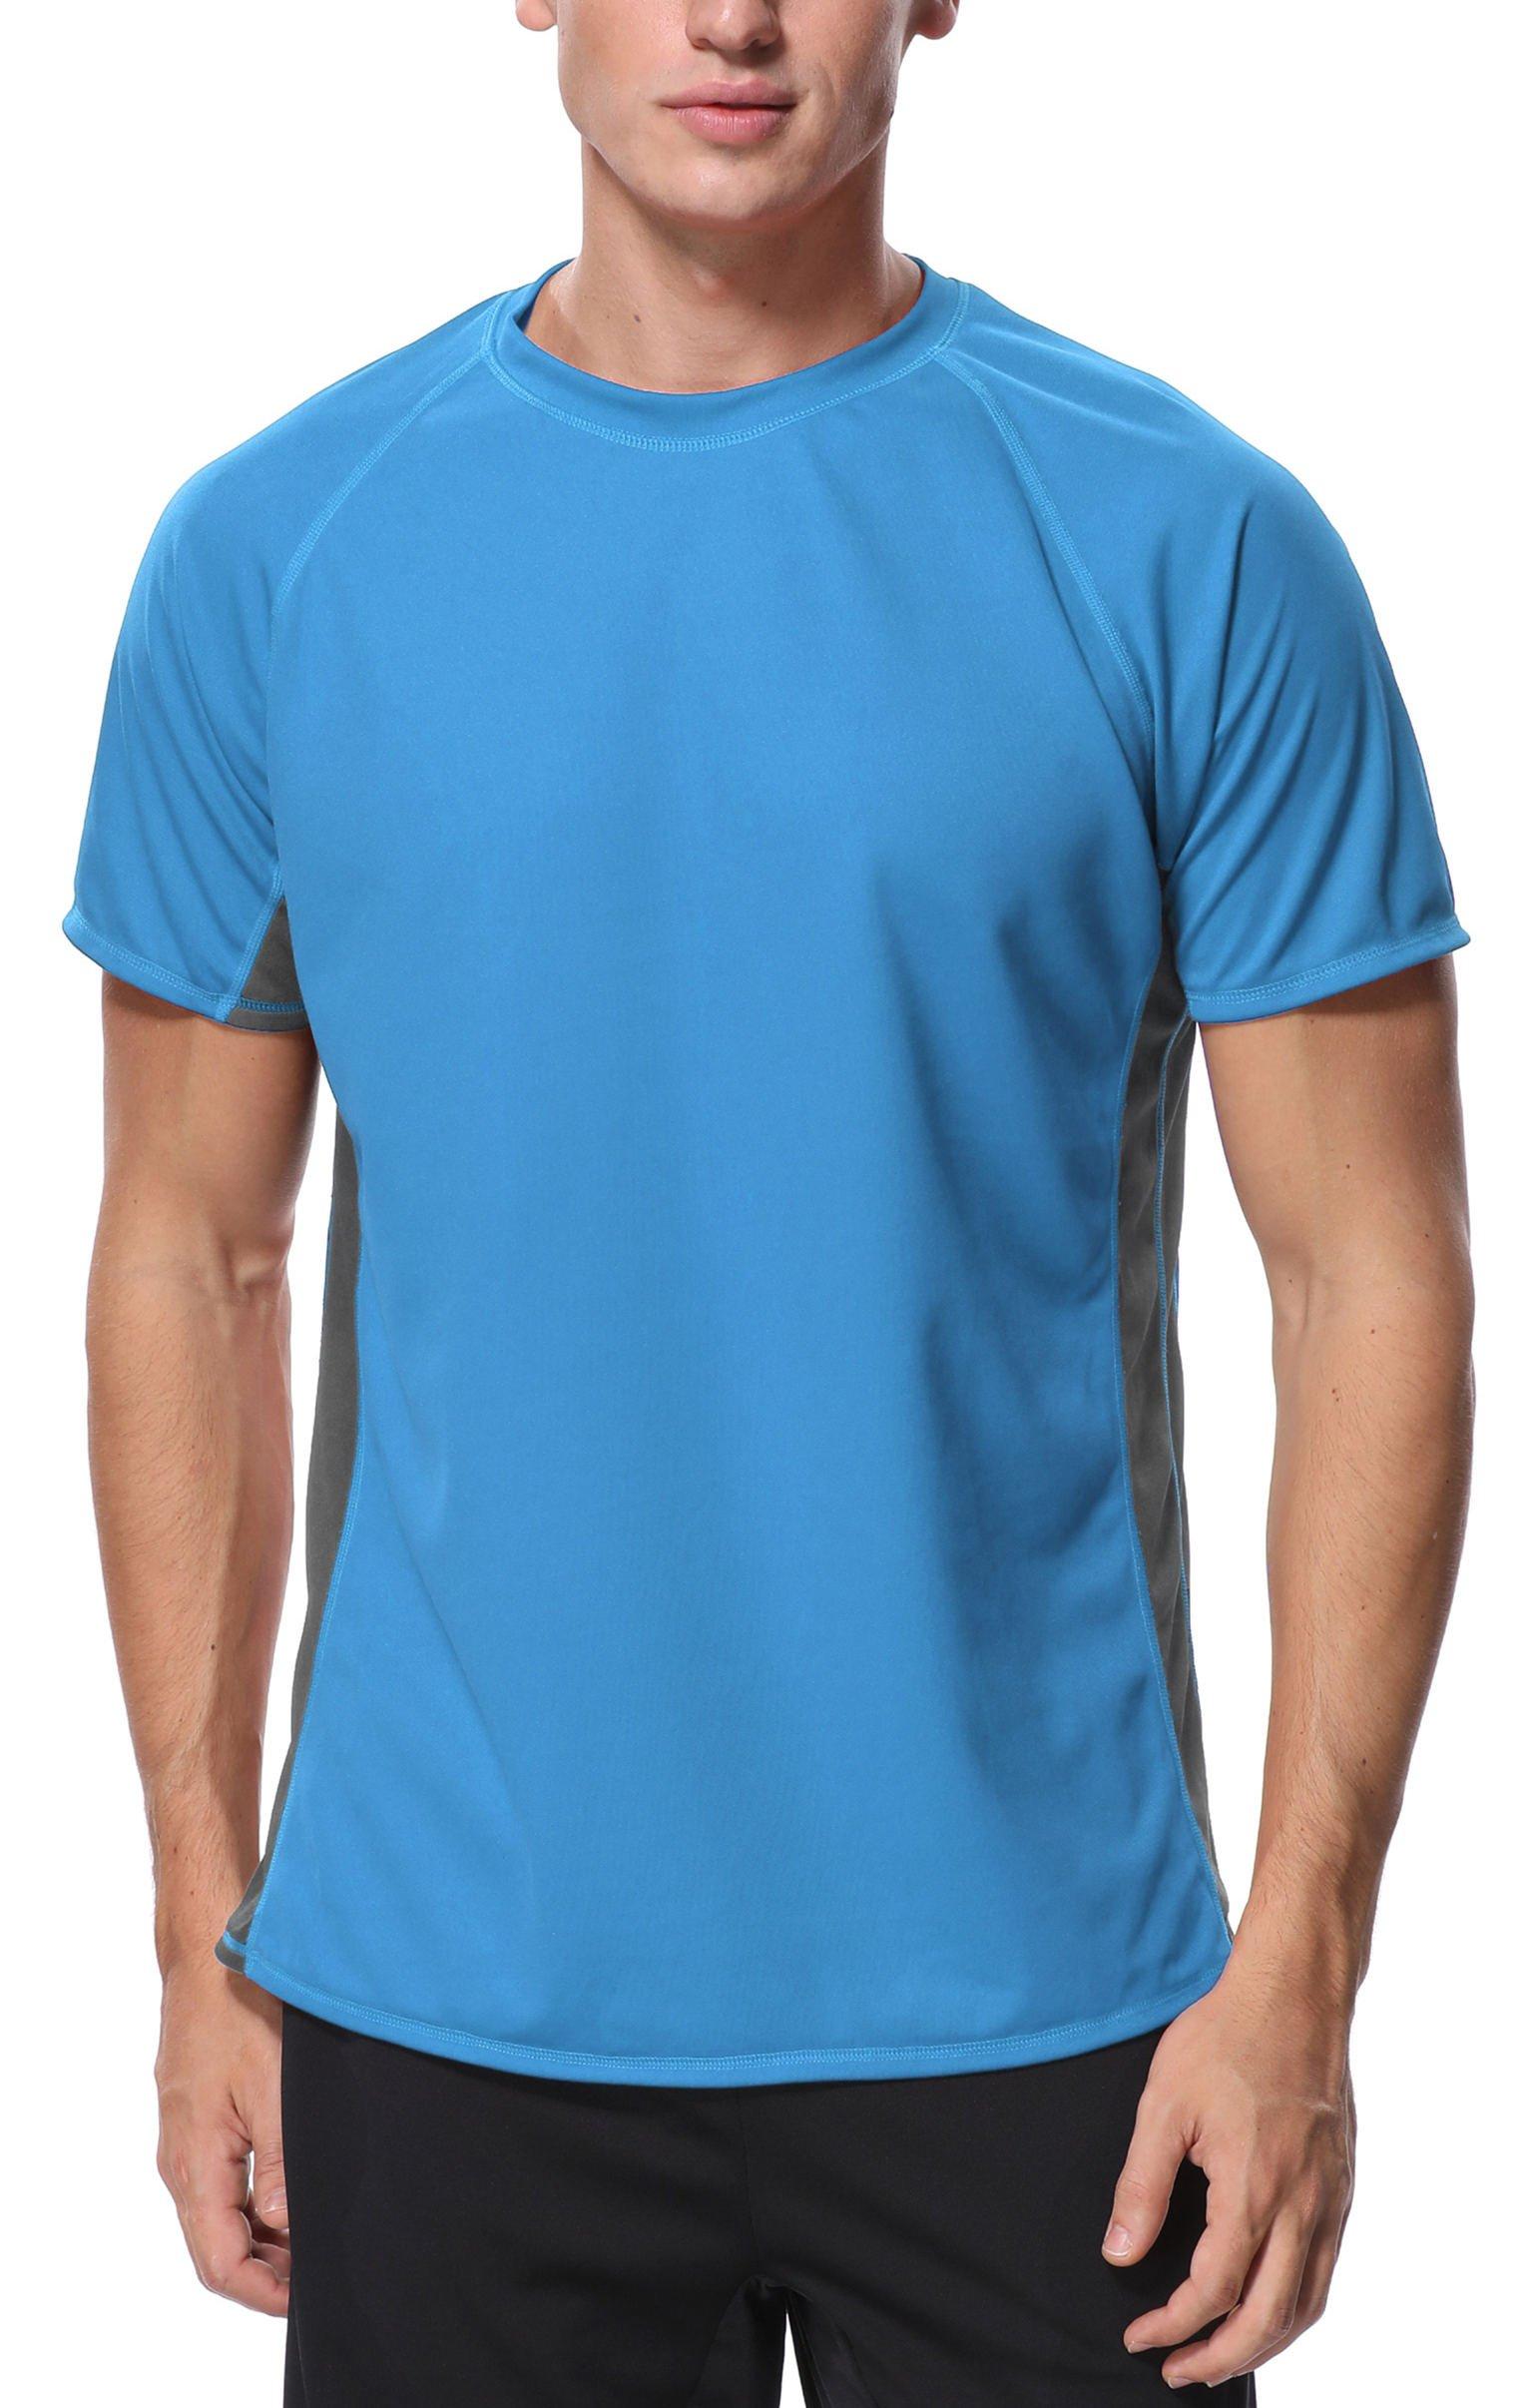 beautyin Men Rash Guard Top UPF 50+ Short Sleeve Sun Shirt Solid Surf Swim Shirt